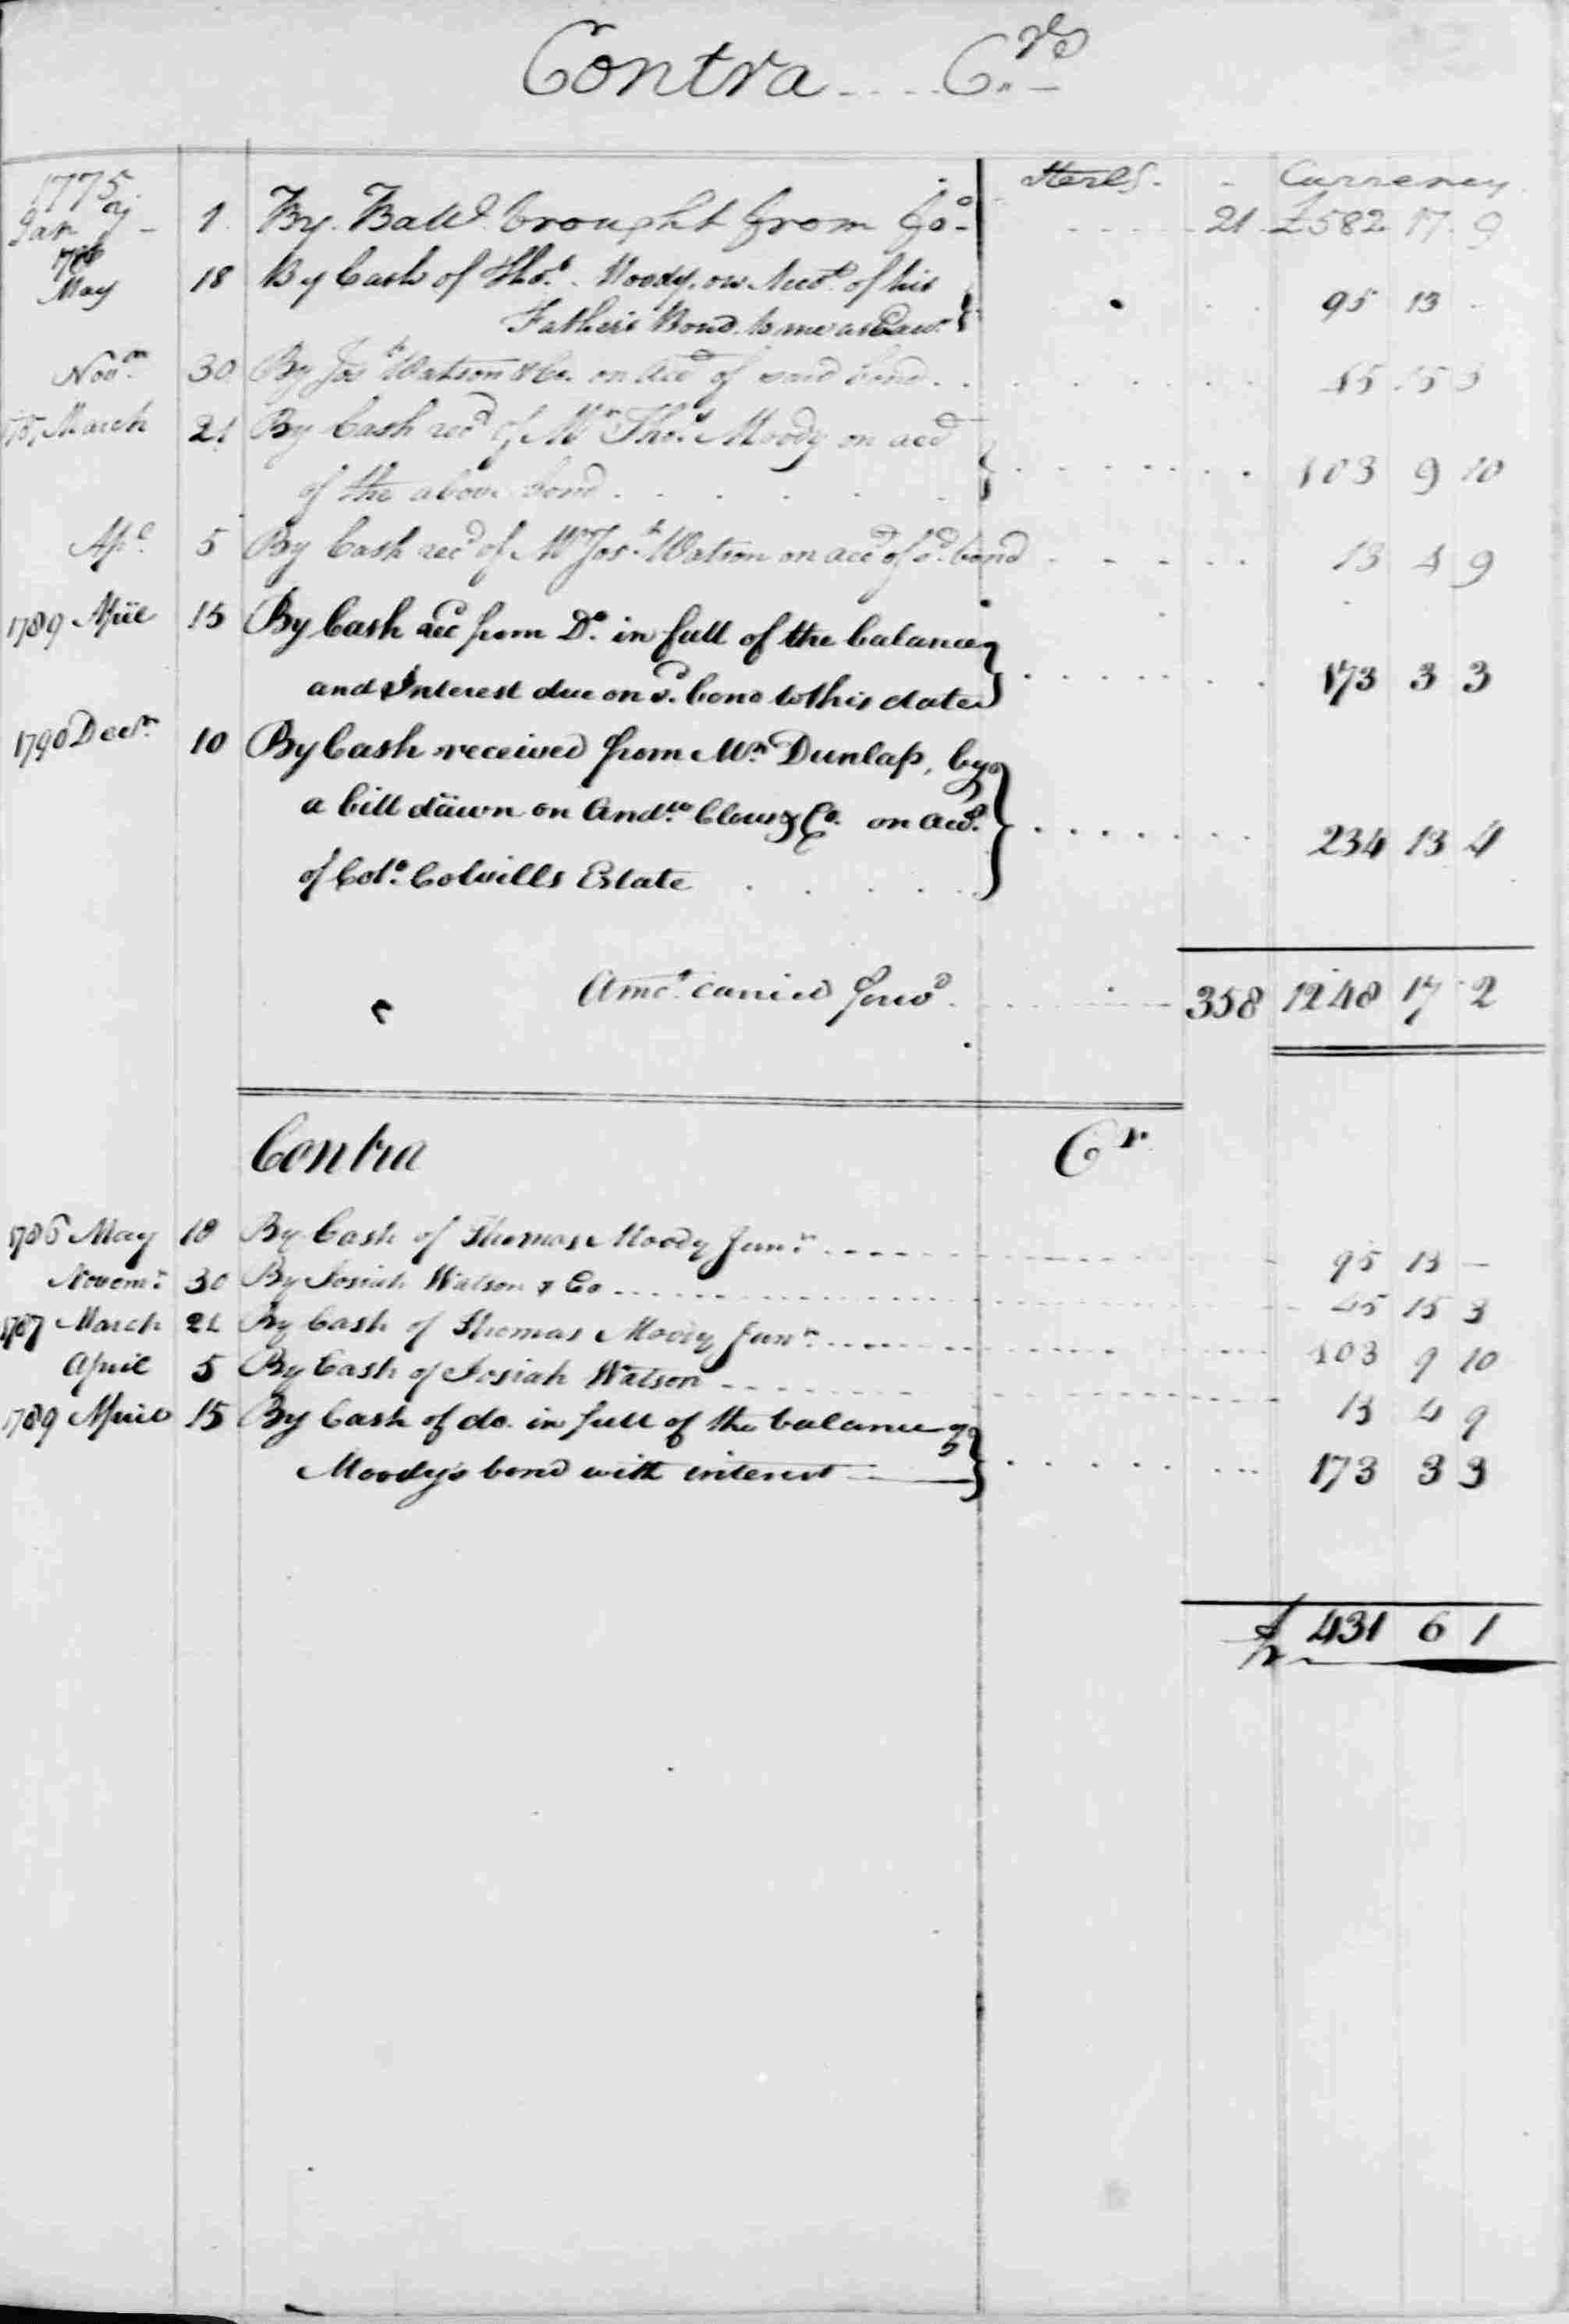 Ledger B, folio 135, right side